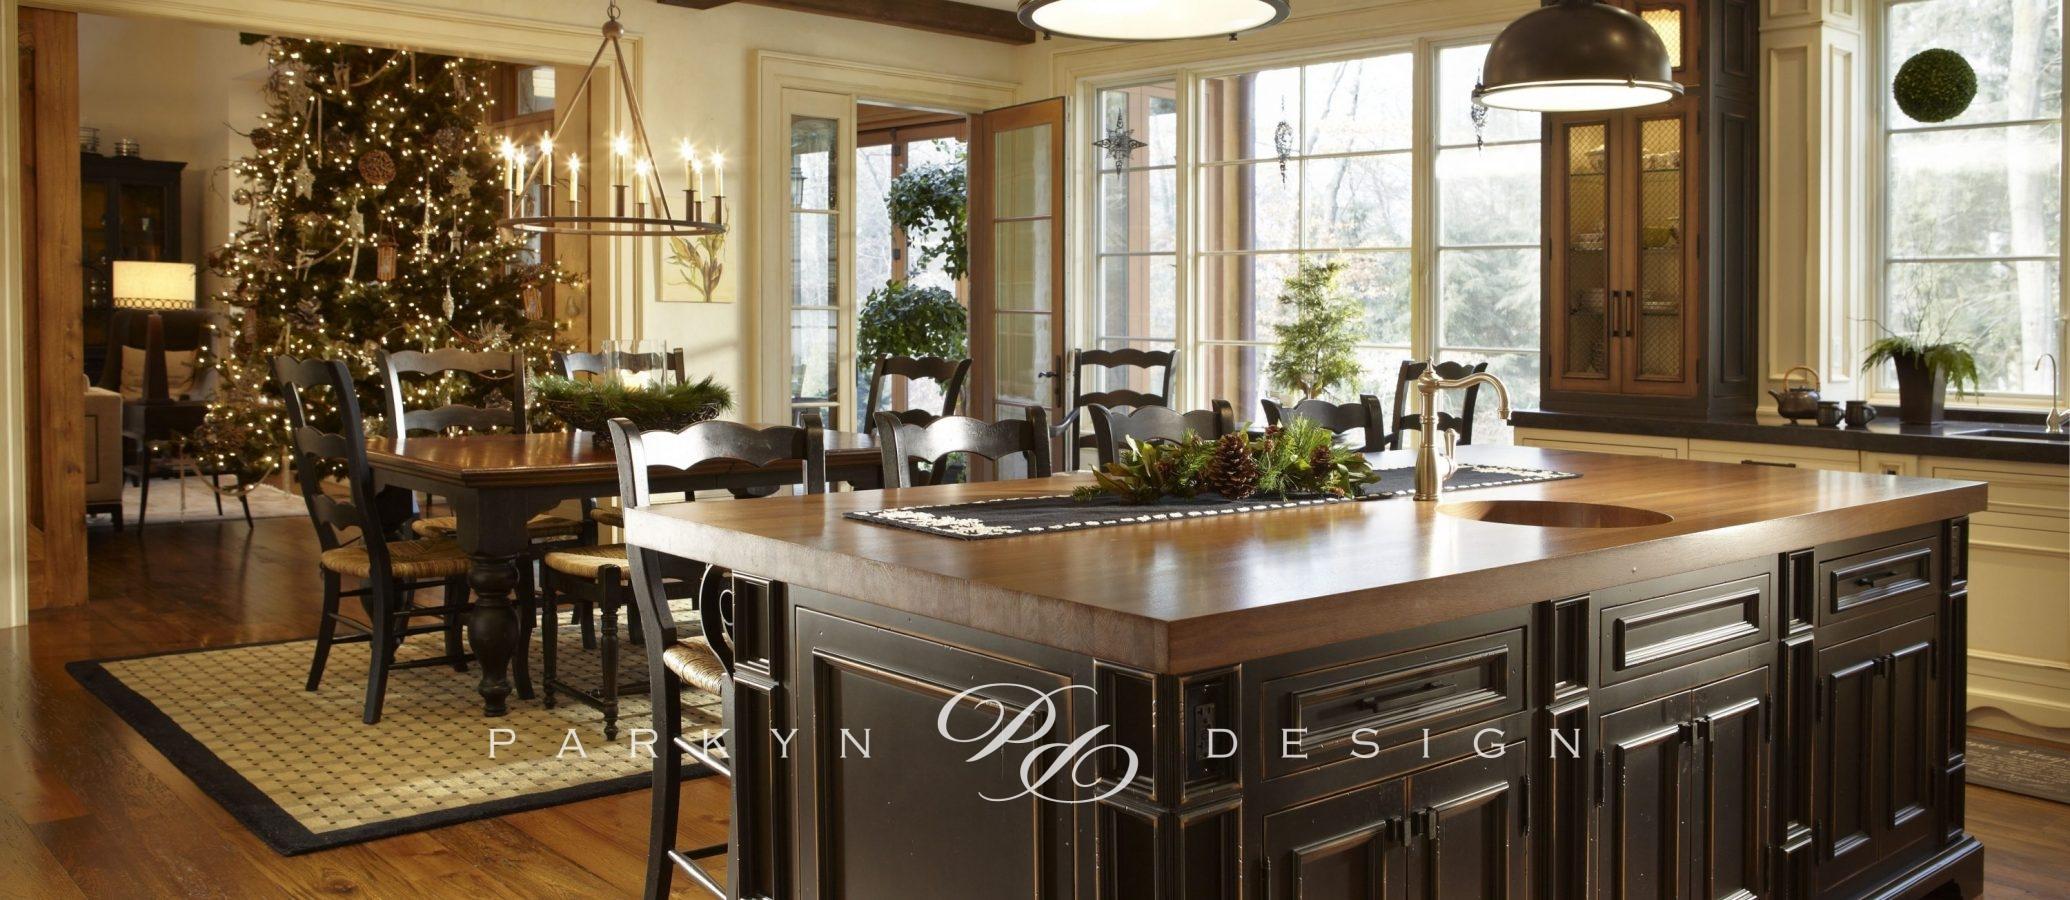 english manor parkyn design interior design oakville